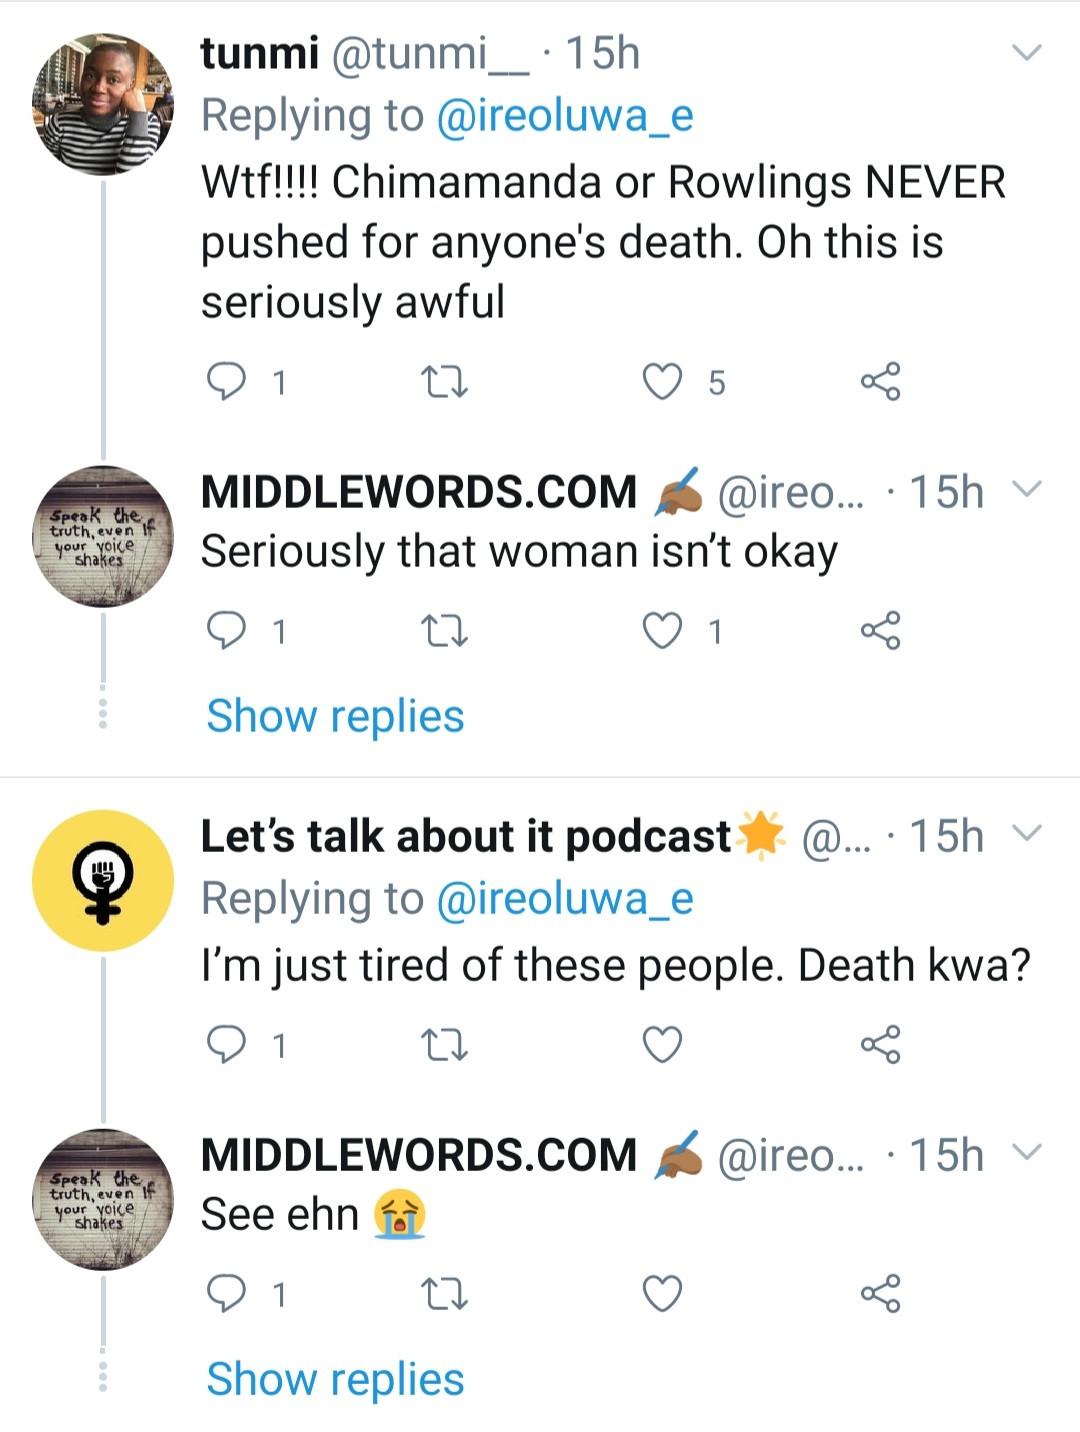 Nigerian writer Akwaeke Emezi calls out Chimamanda Adichie and JK Rowling; accuses them of supporting the killing of transgender children